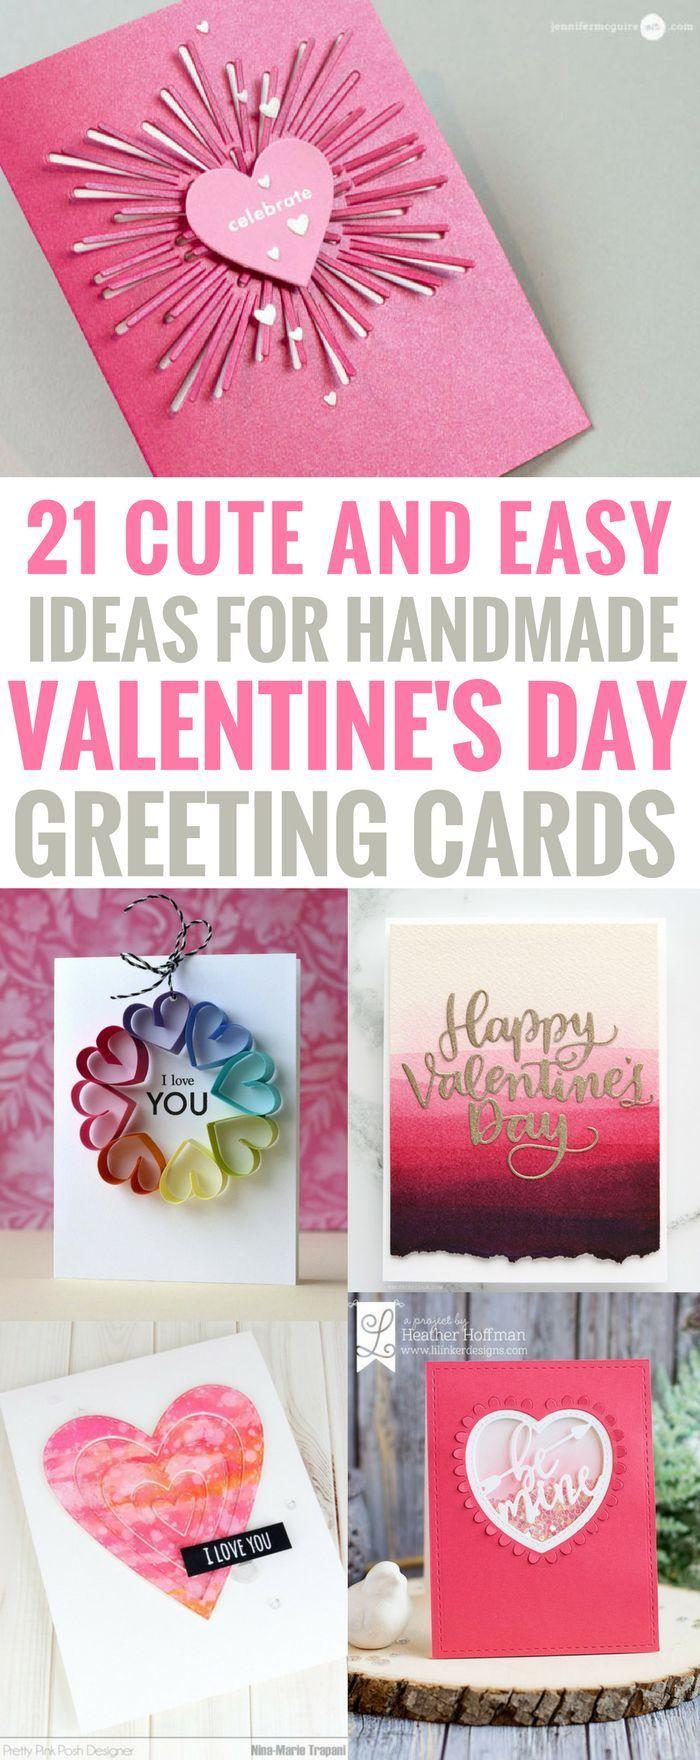 #Valentinesday #papercrafts #greetingcard DIY Valentines Day Cards - Easy Handma...